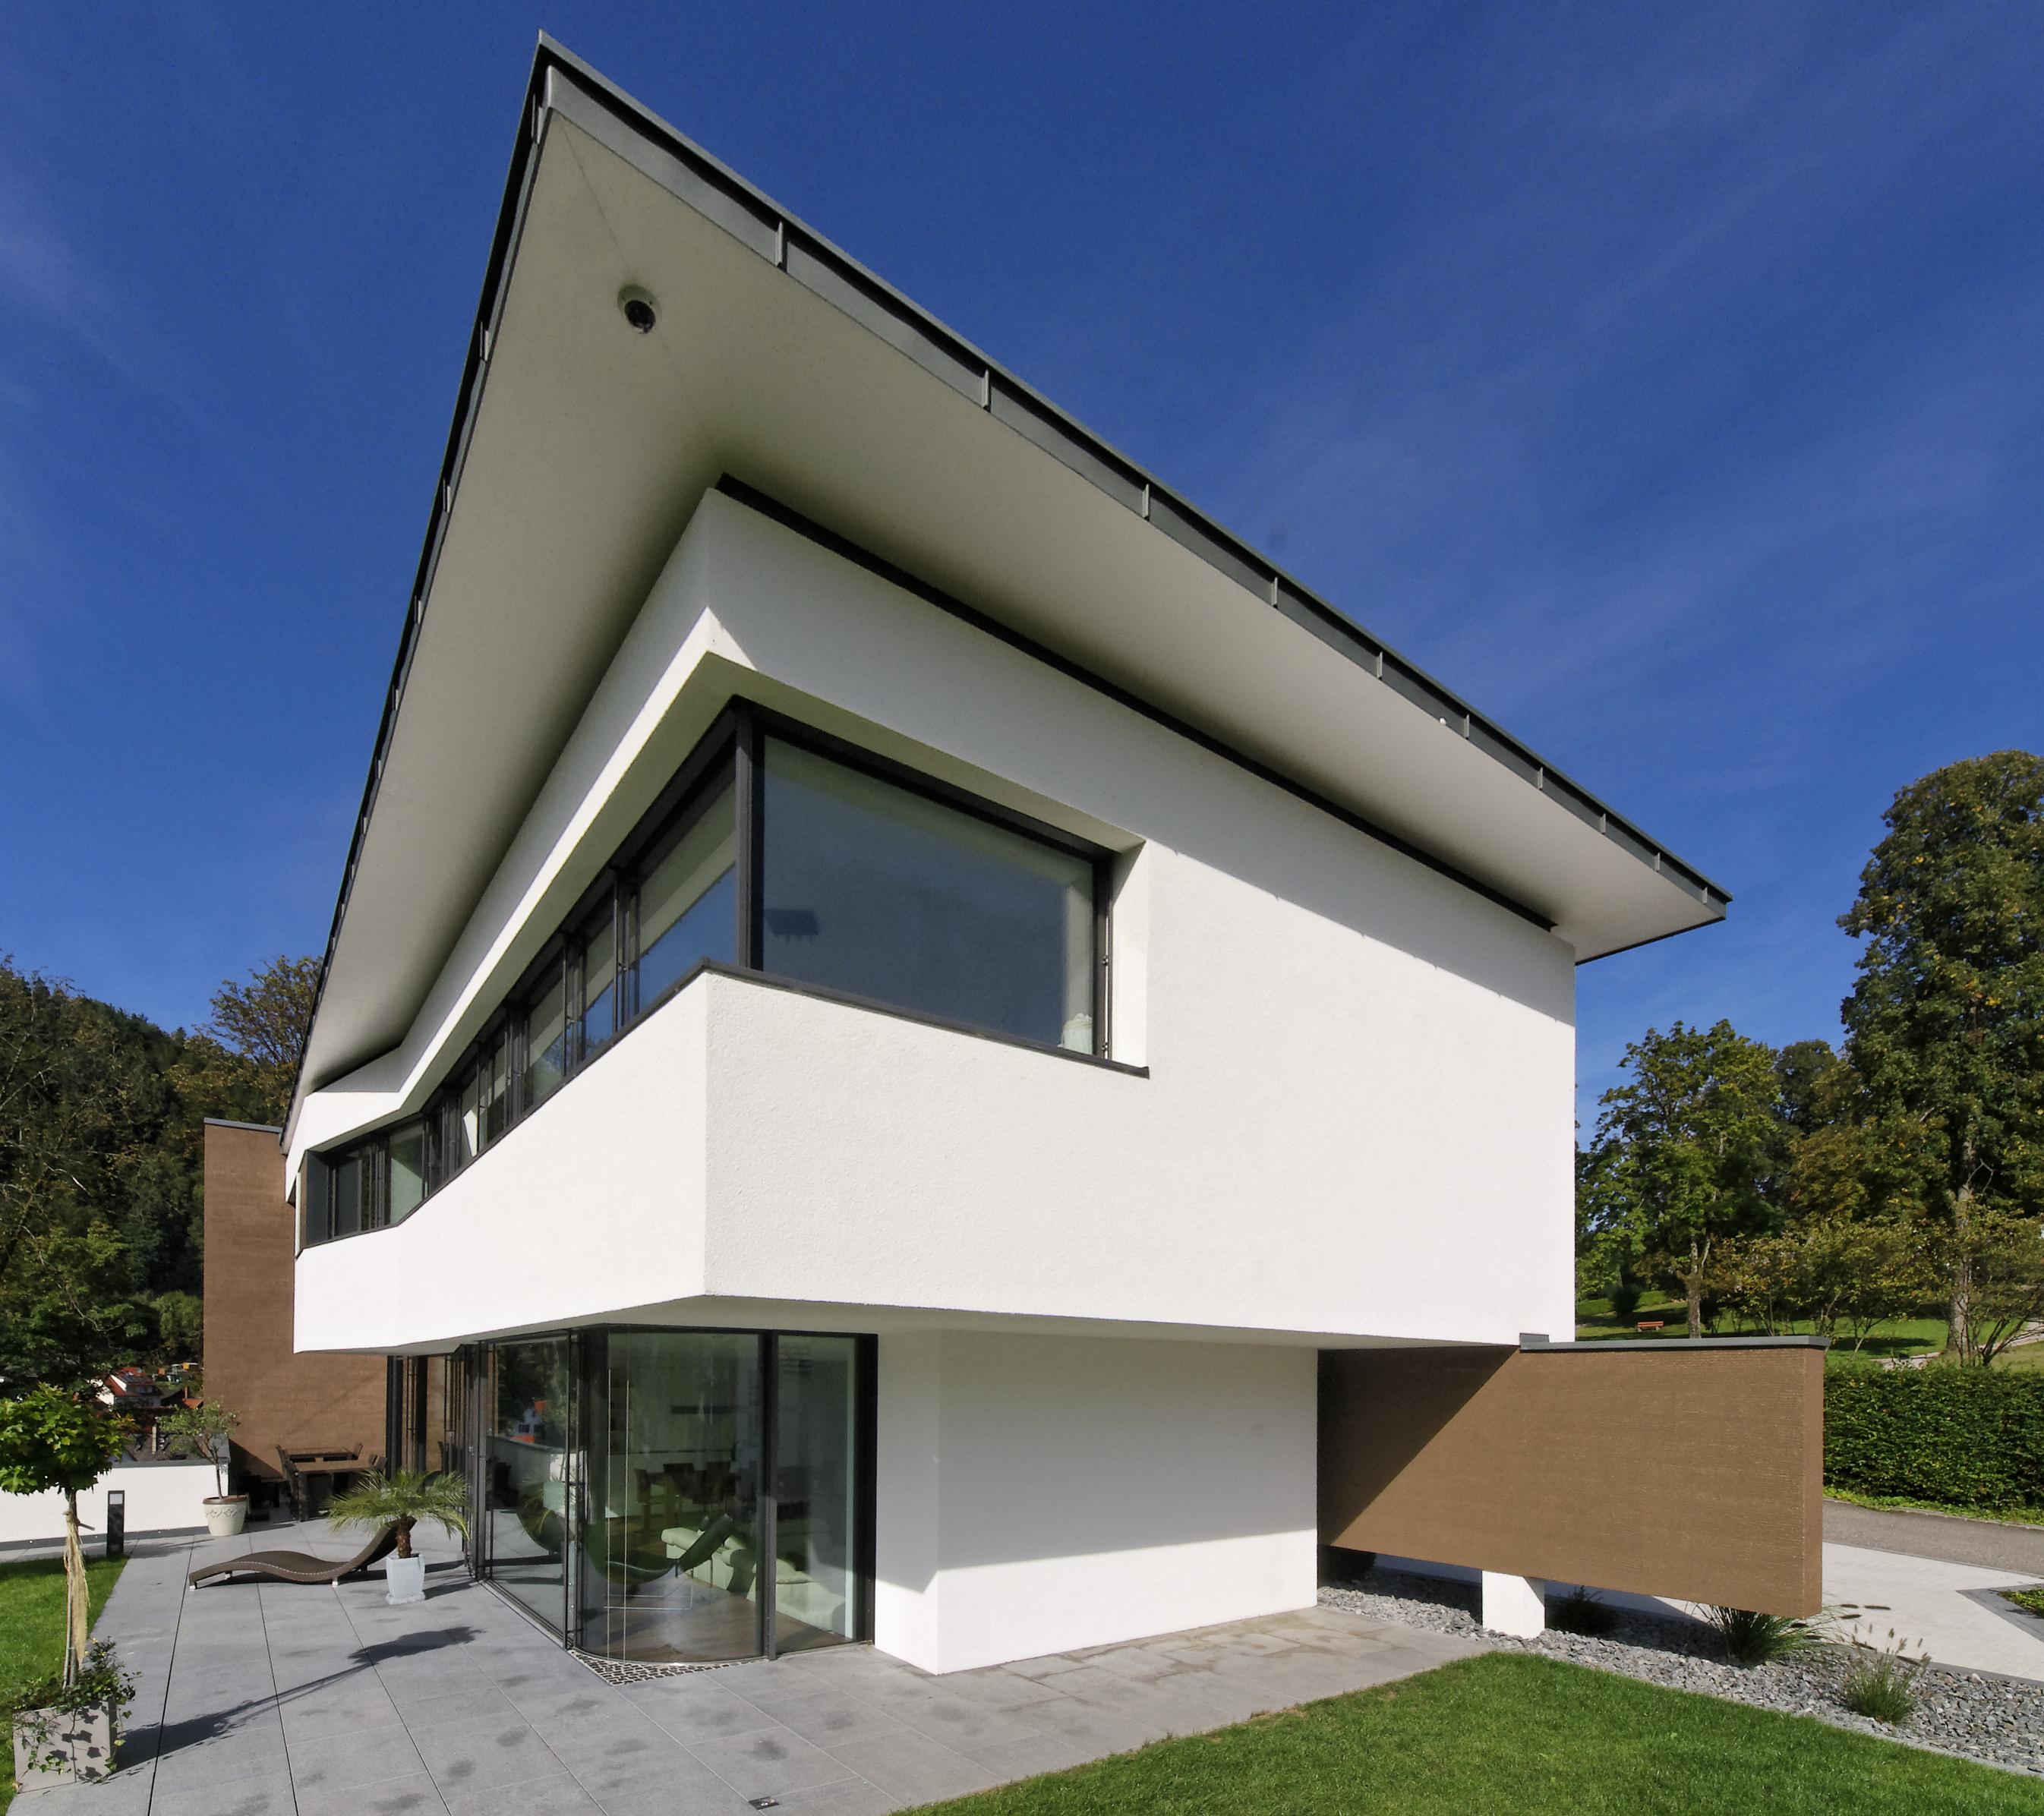 House E., Oppenau